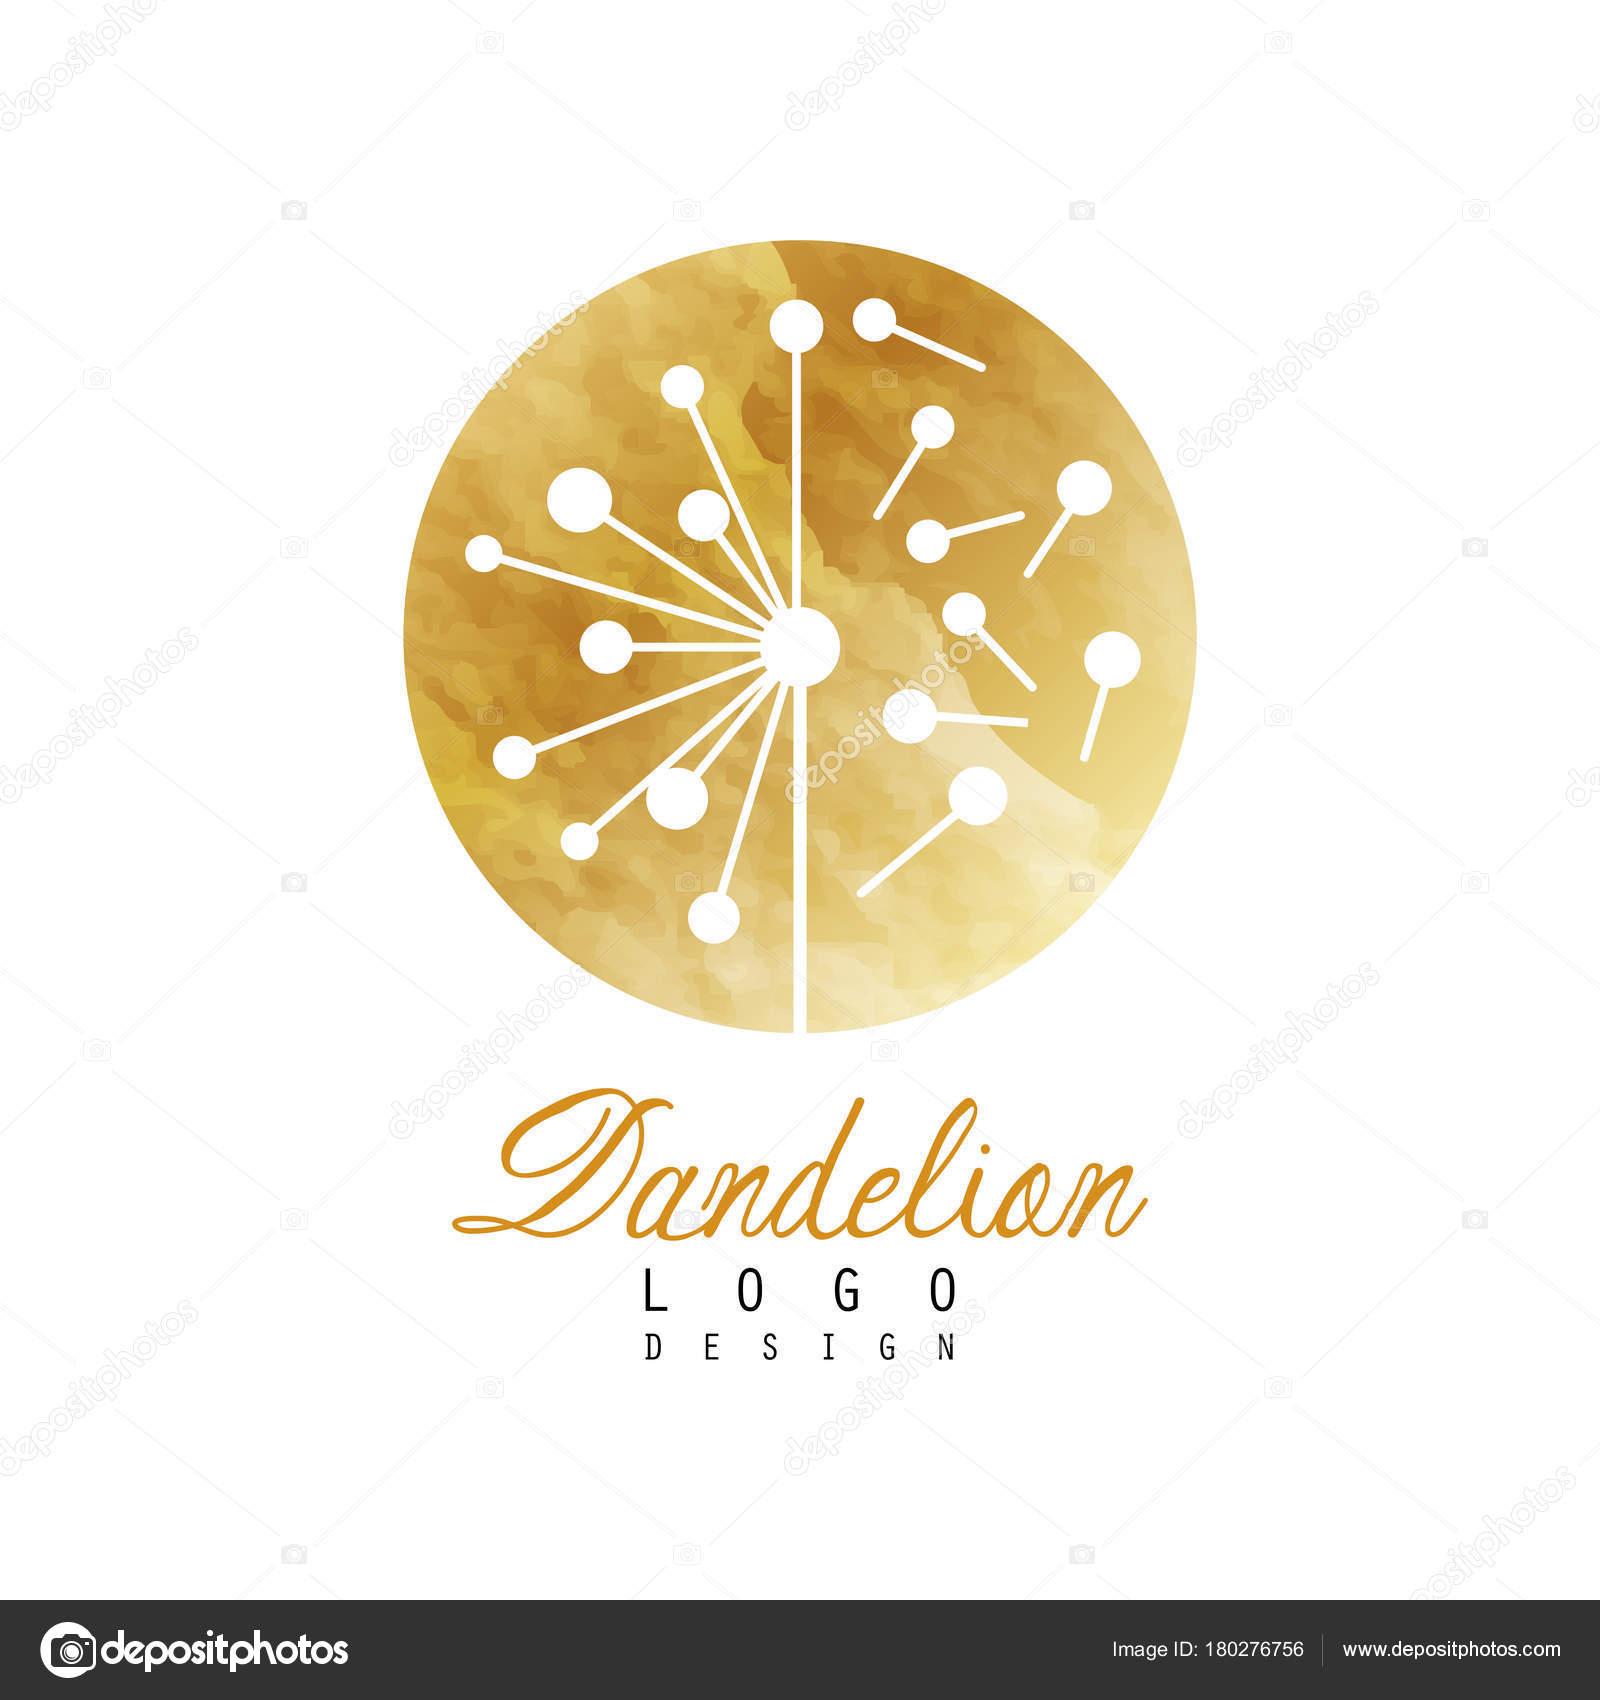 luxury dandelion logo design template textured golden emblem with